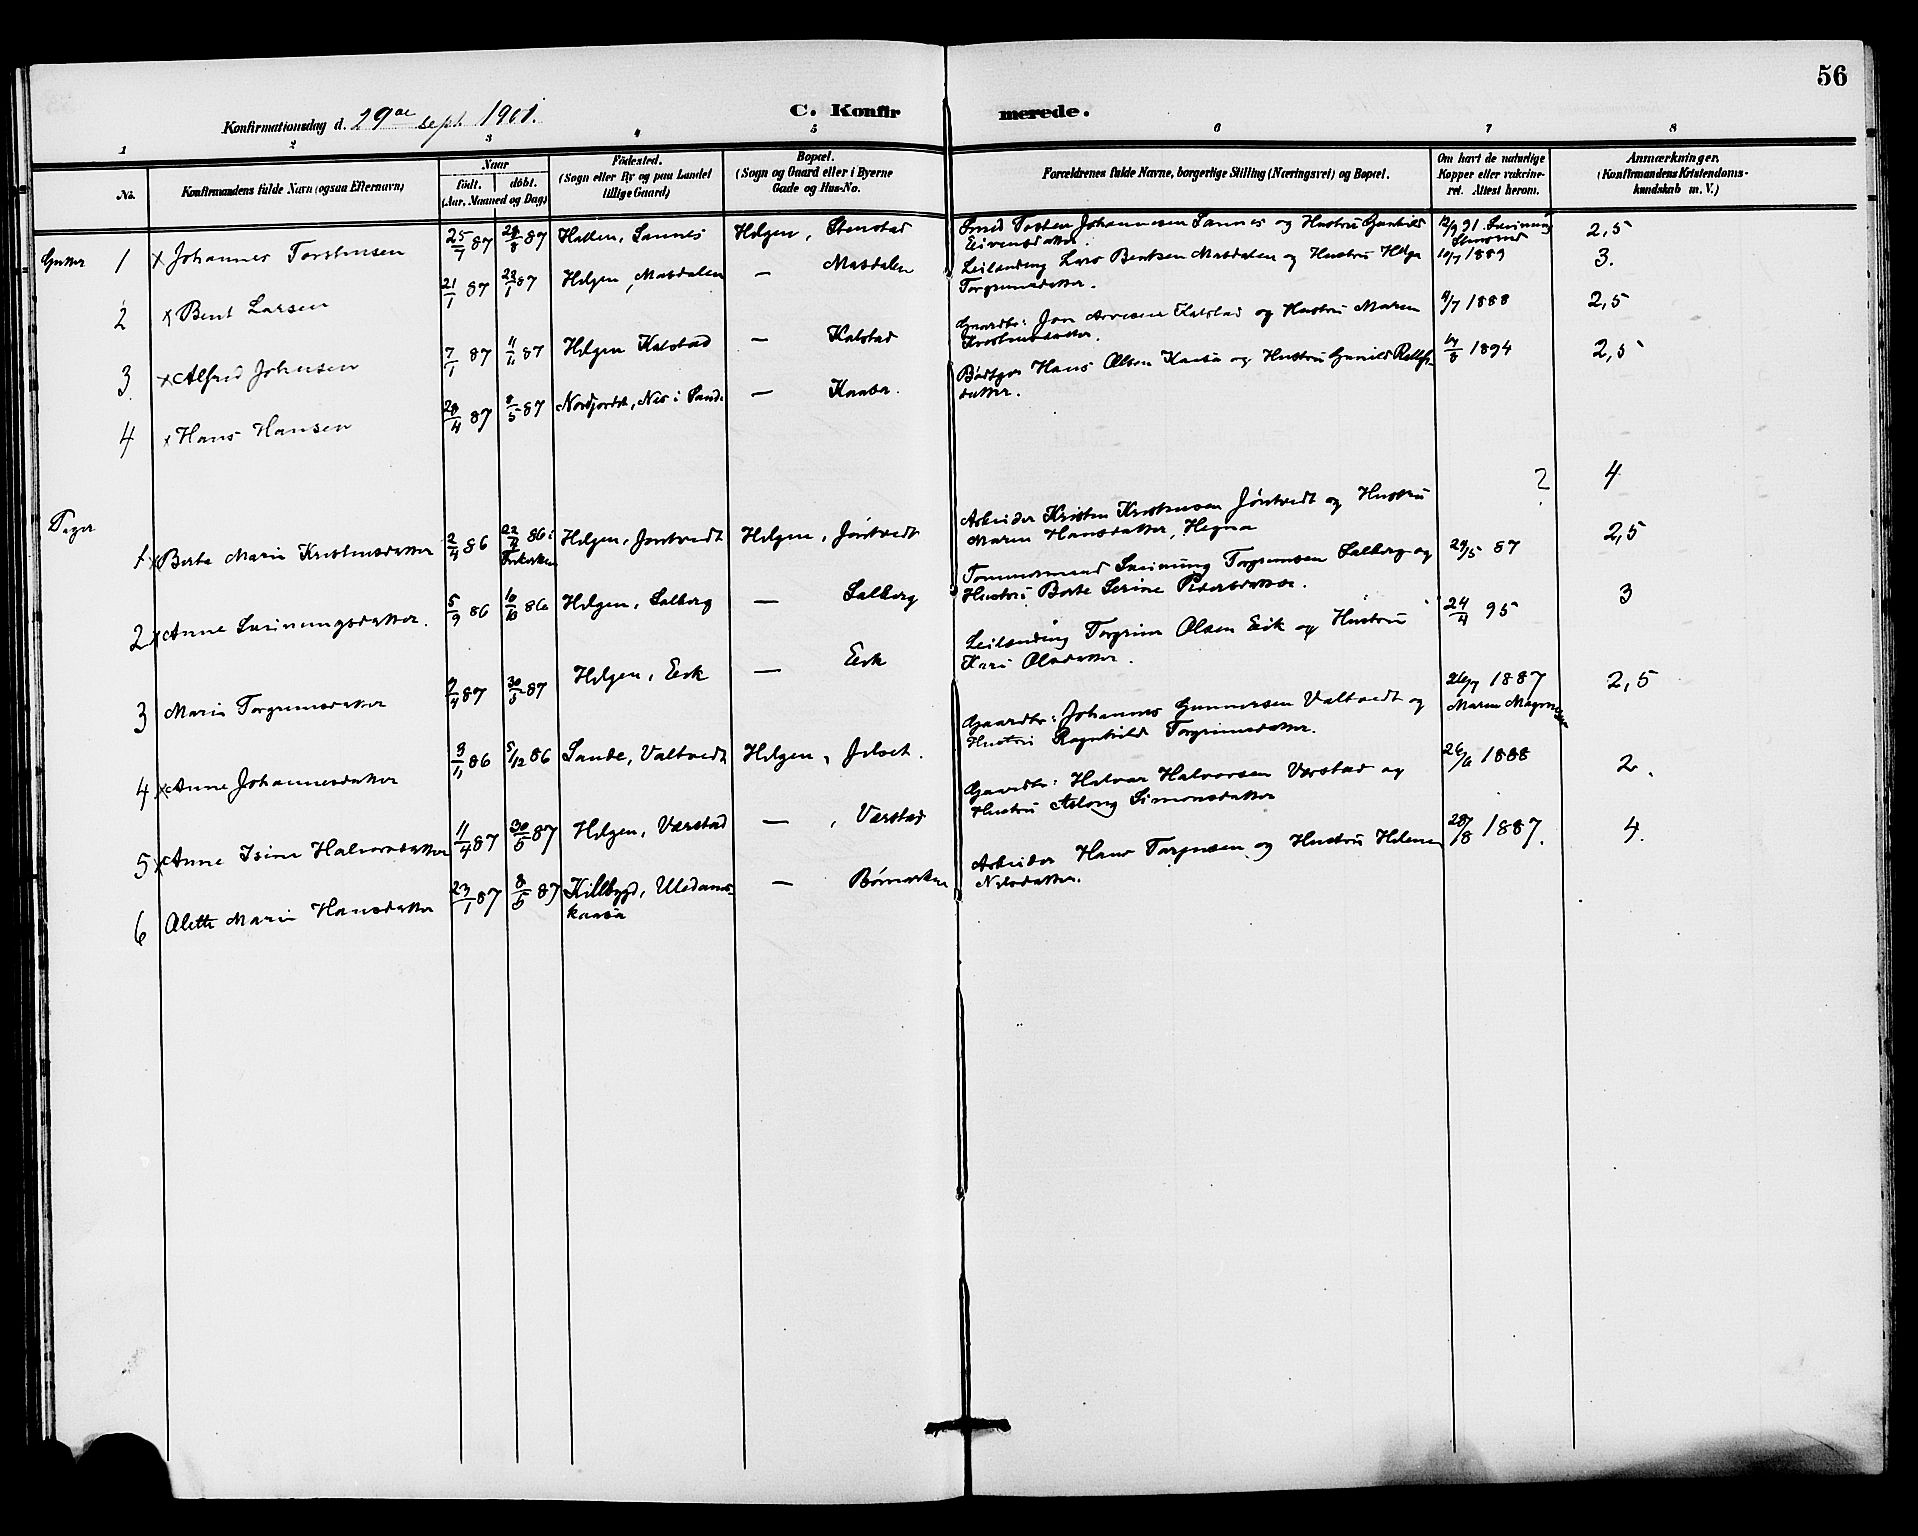 SAKO, Holla kirkebøker, G/Gb/L0002: Klokkerbok nr. II 2, 1897-1913, s. 56